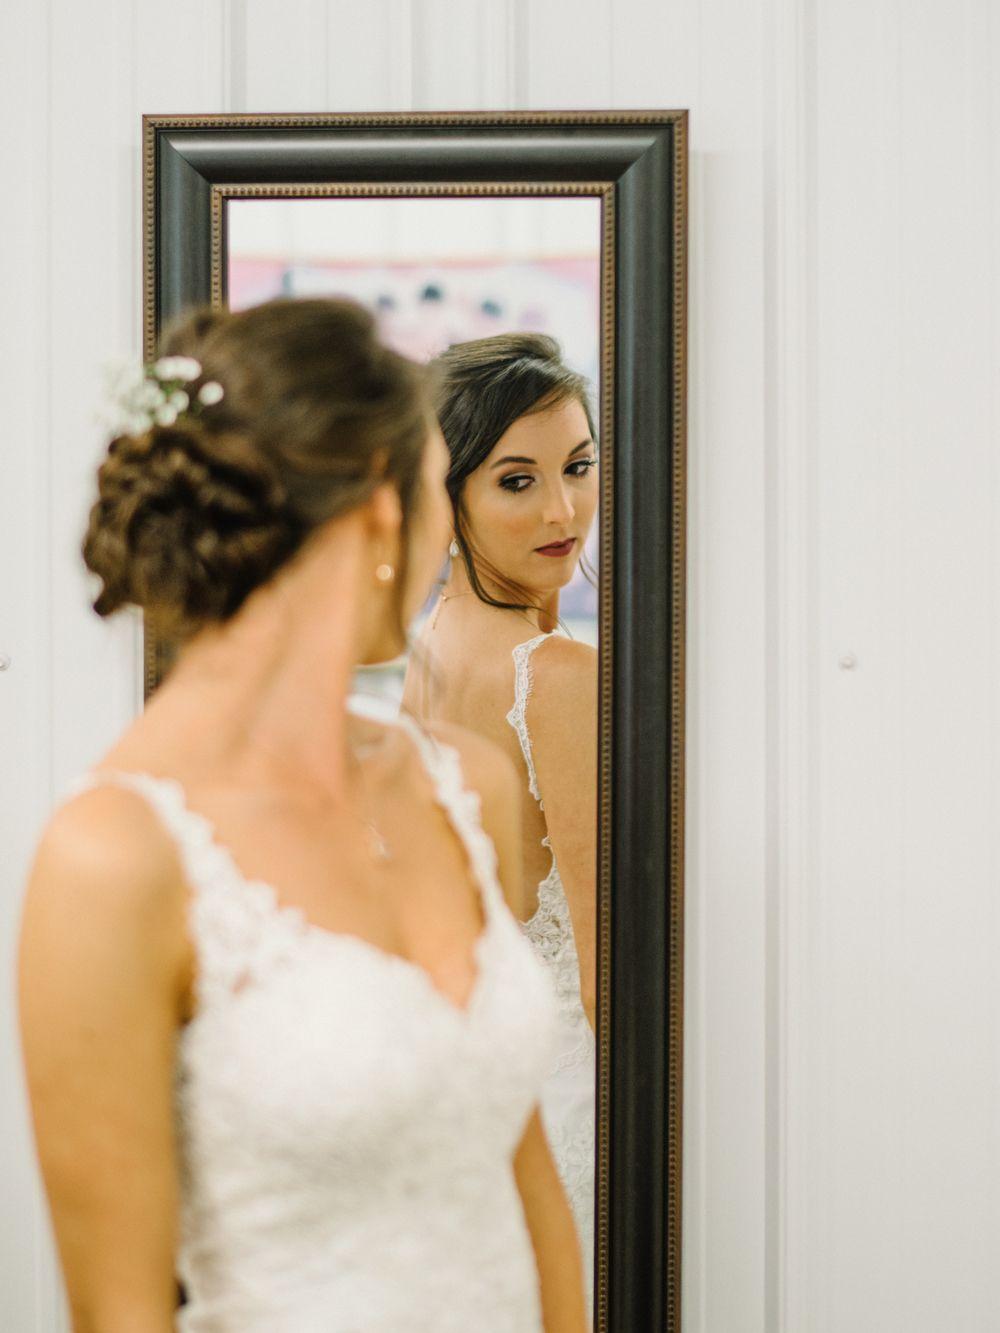 The dress gallery wichita kansas - Wichita Ks Based Documentary And Wedding Photographer Available For Travel Worldwide